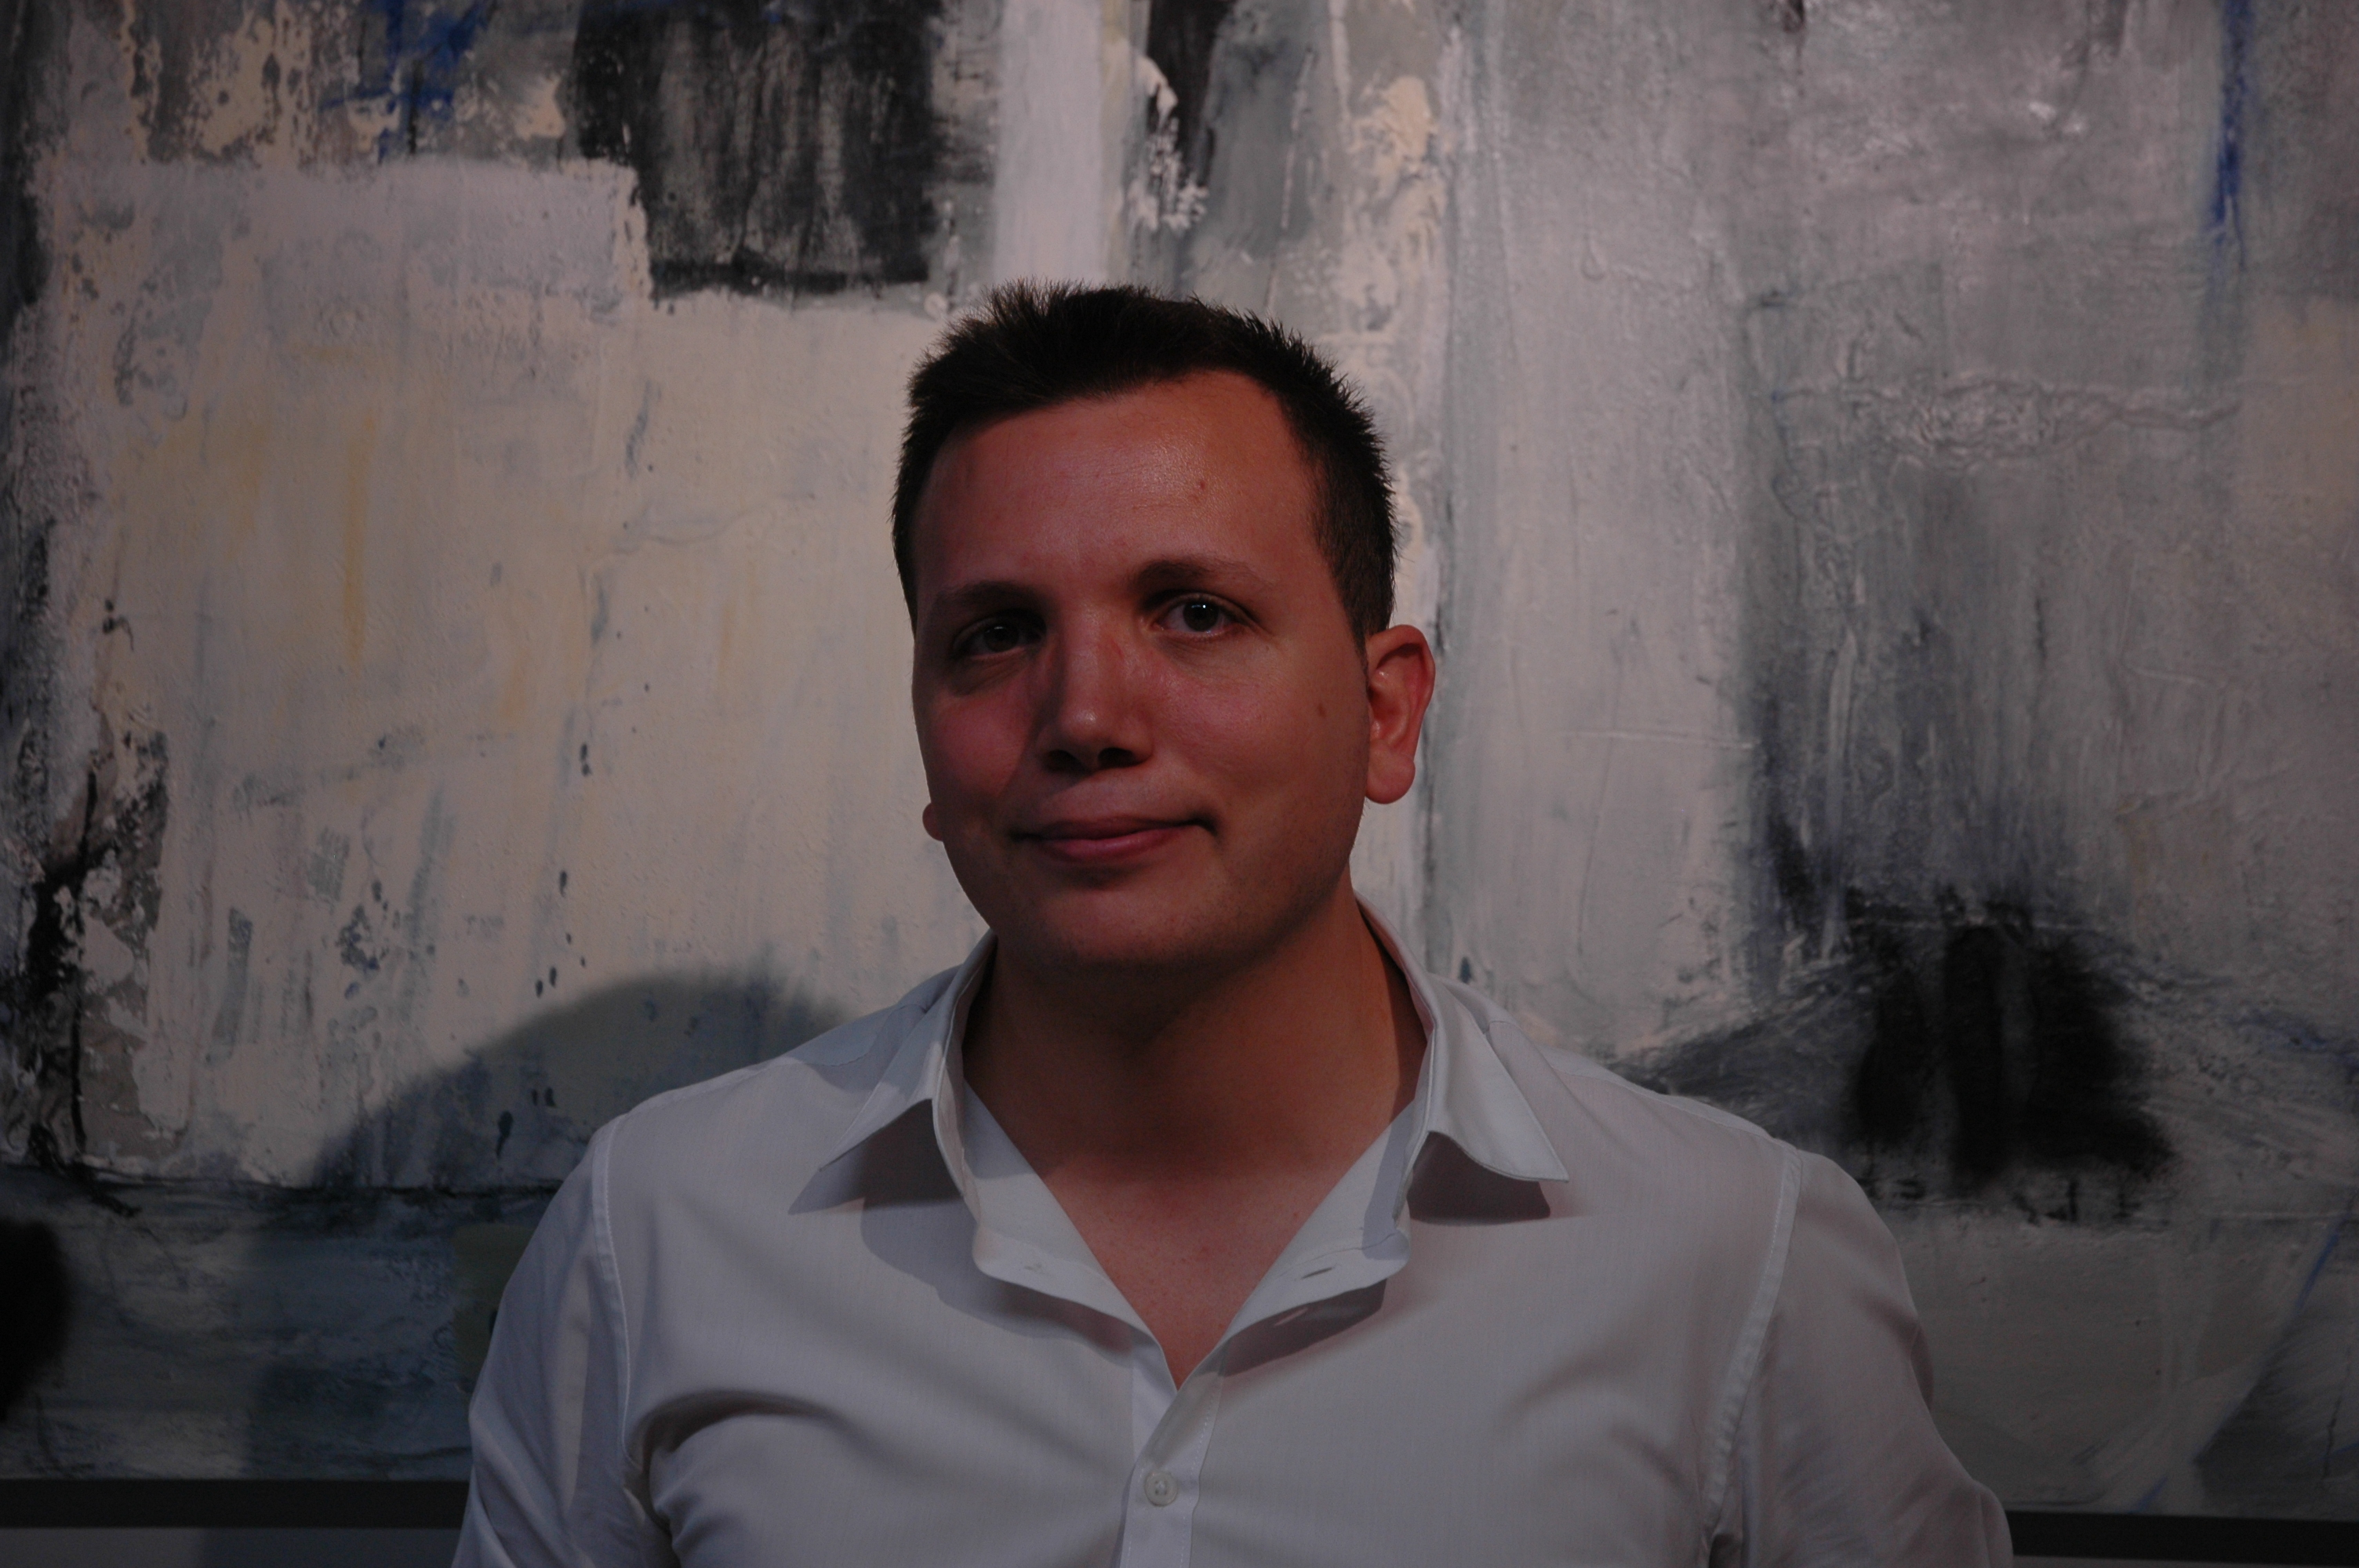 David Banegas